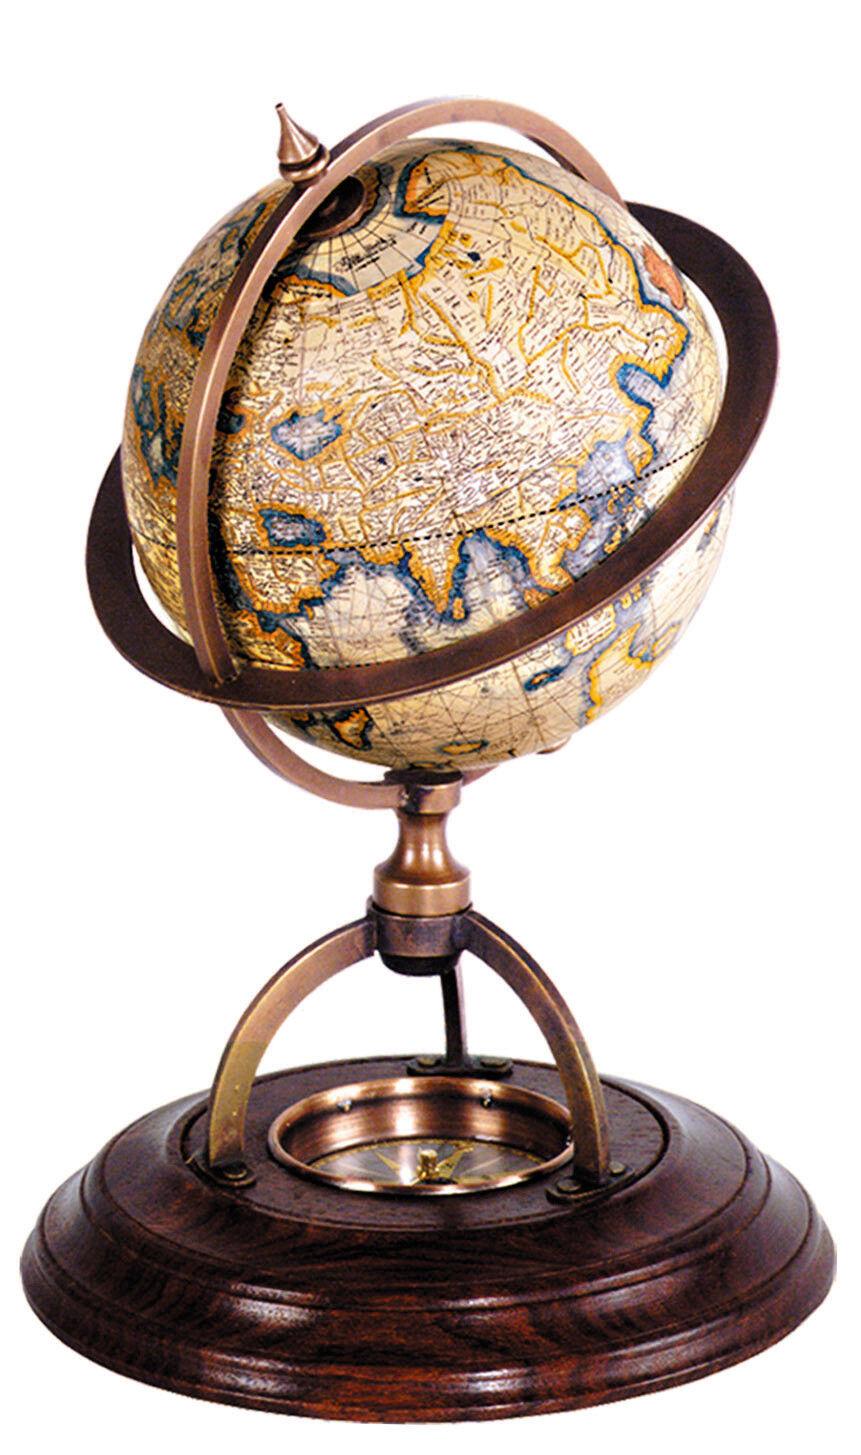 Terrestrial Globe with Compass - Handcrafted Replica - Featu